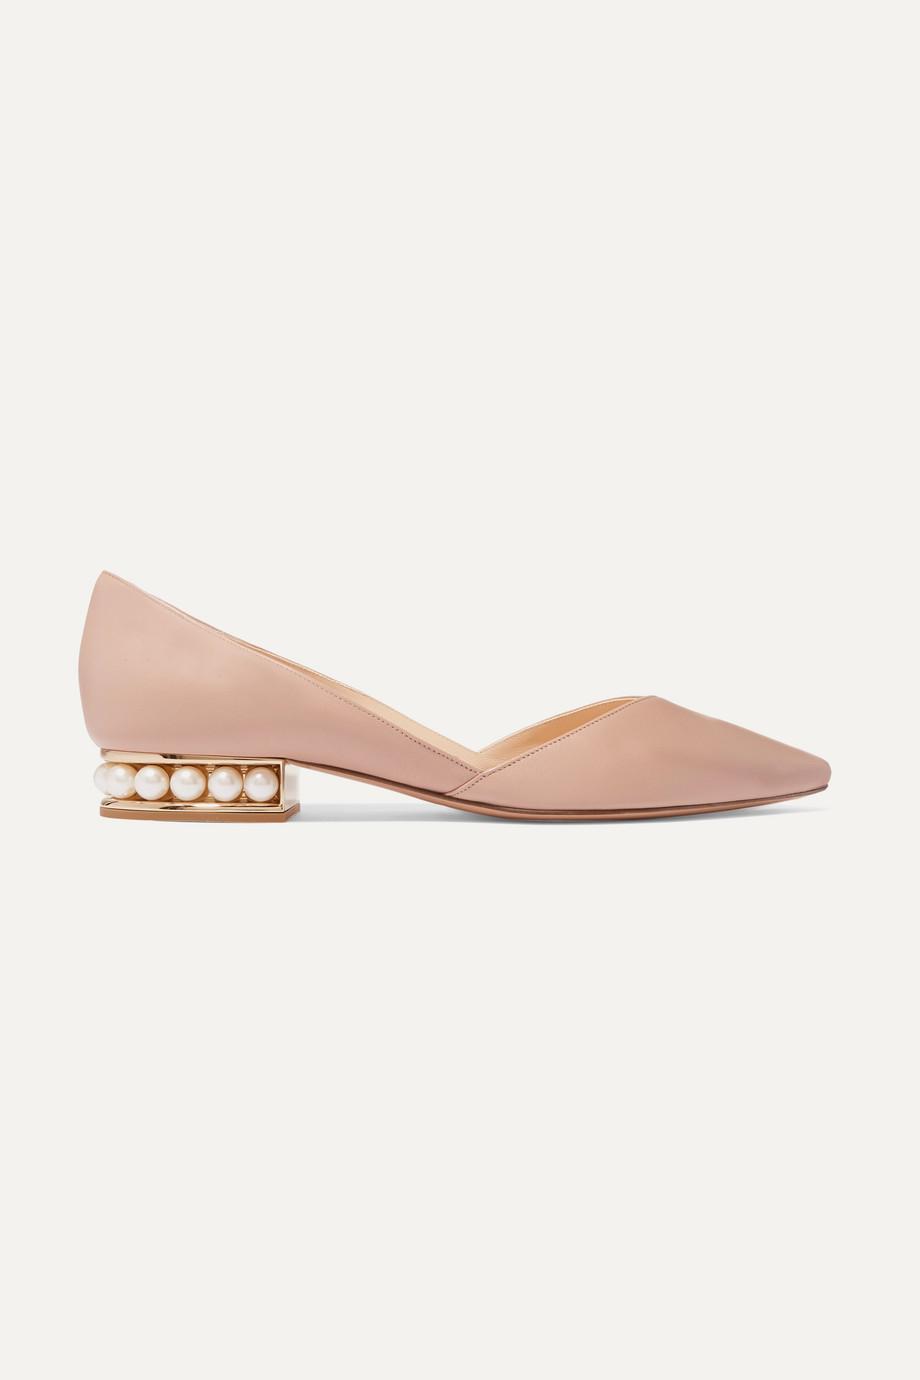 Nicholas Kirkwood Casati embellished leather point-toe flats